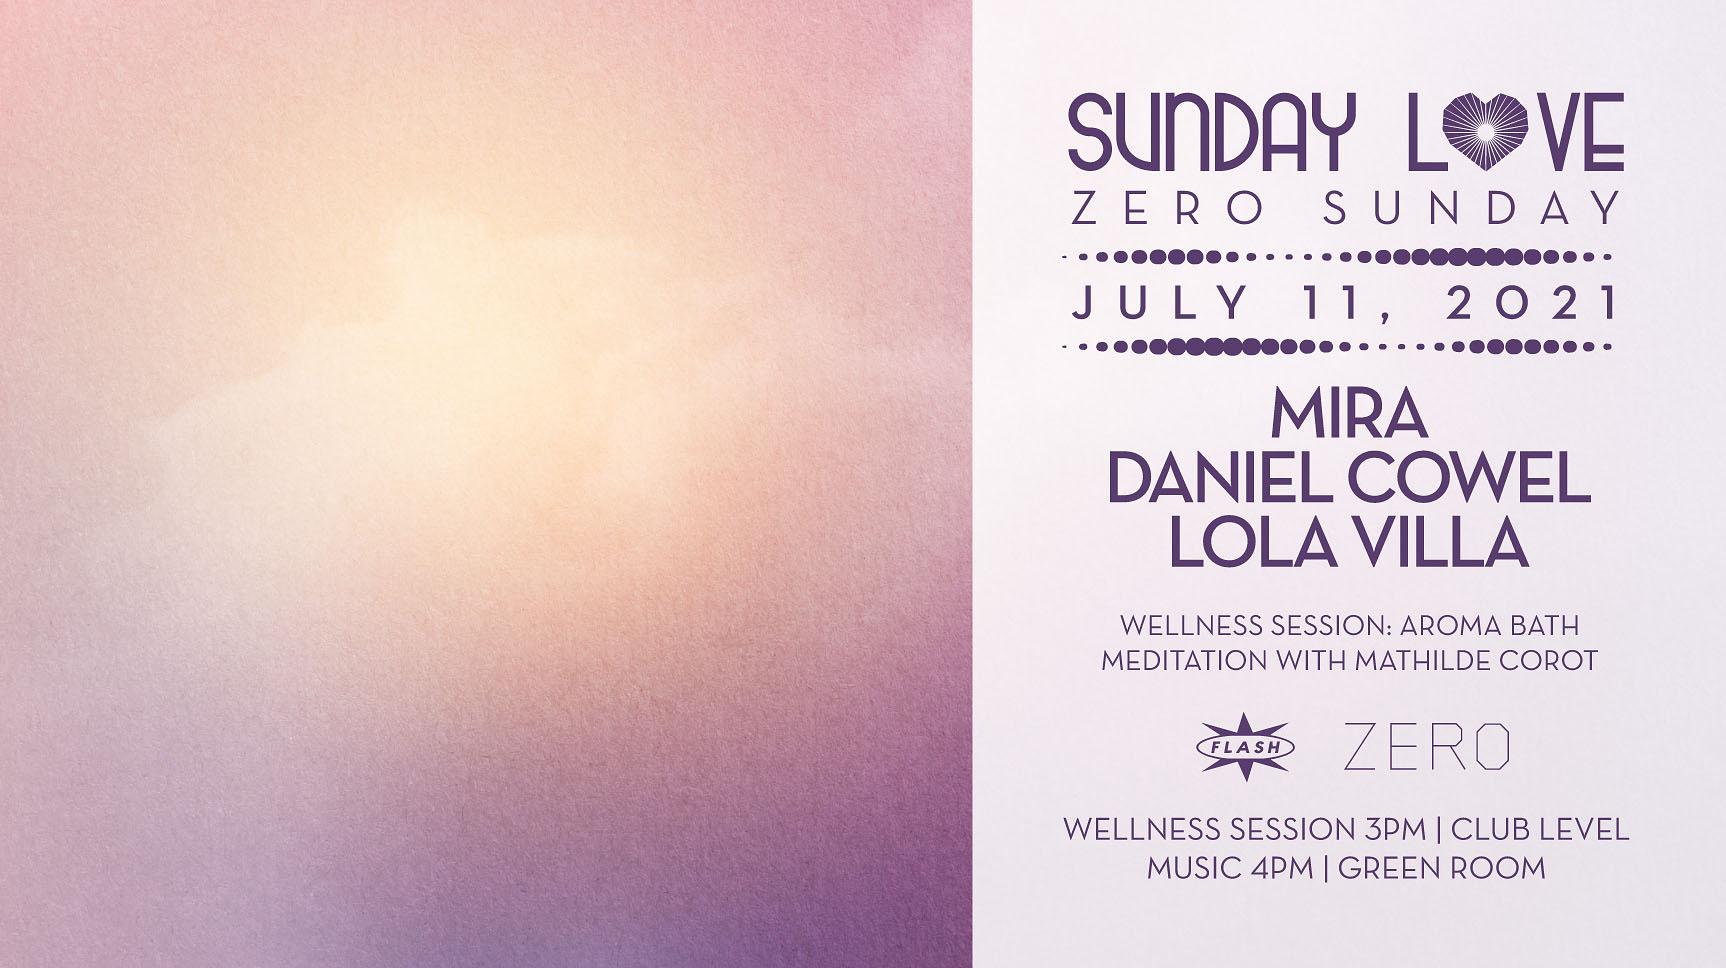 Sunday Love x ZERO: Mira - Daniel Cowel - Lola Villa